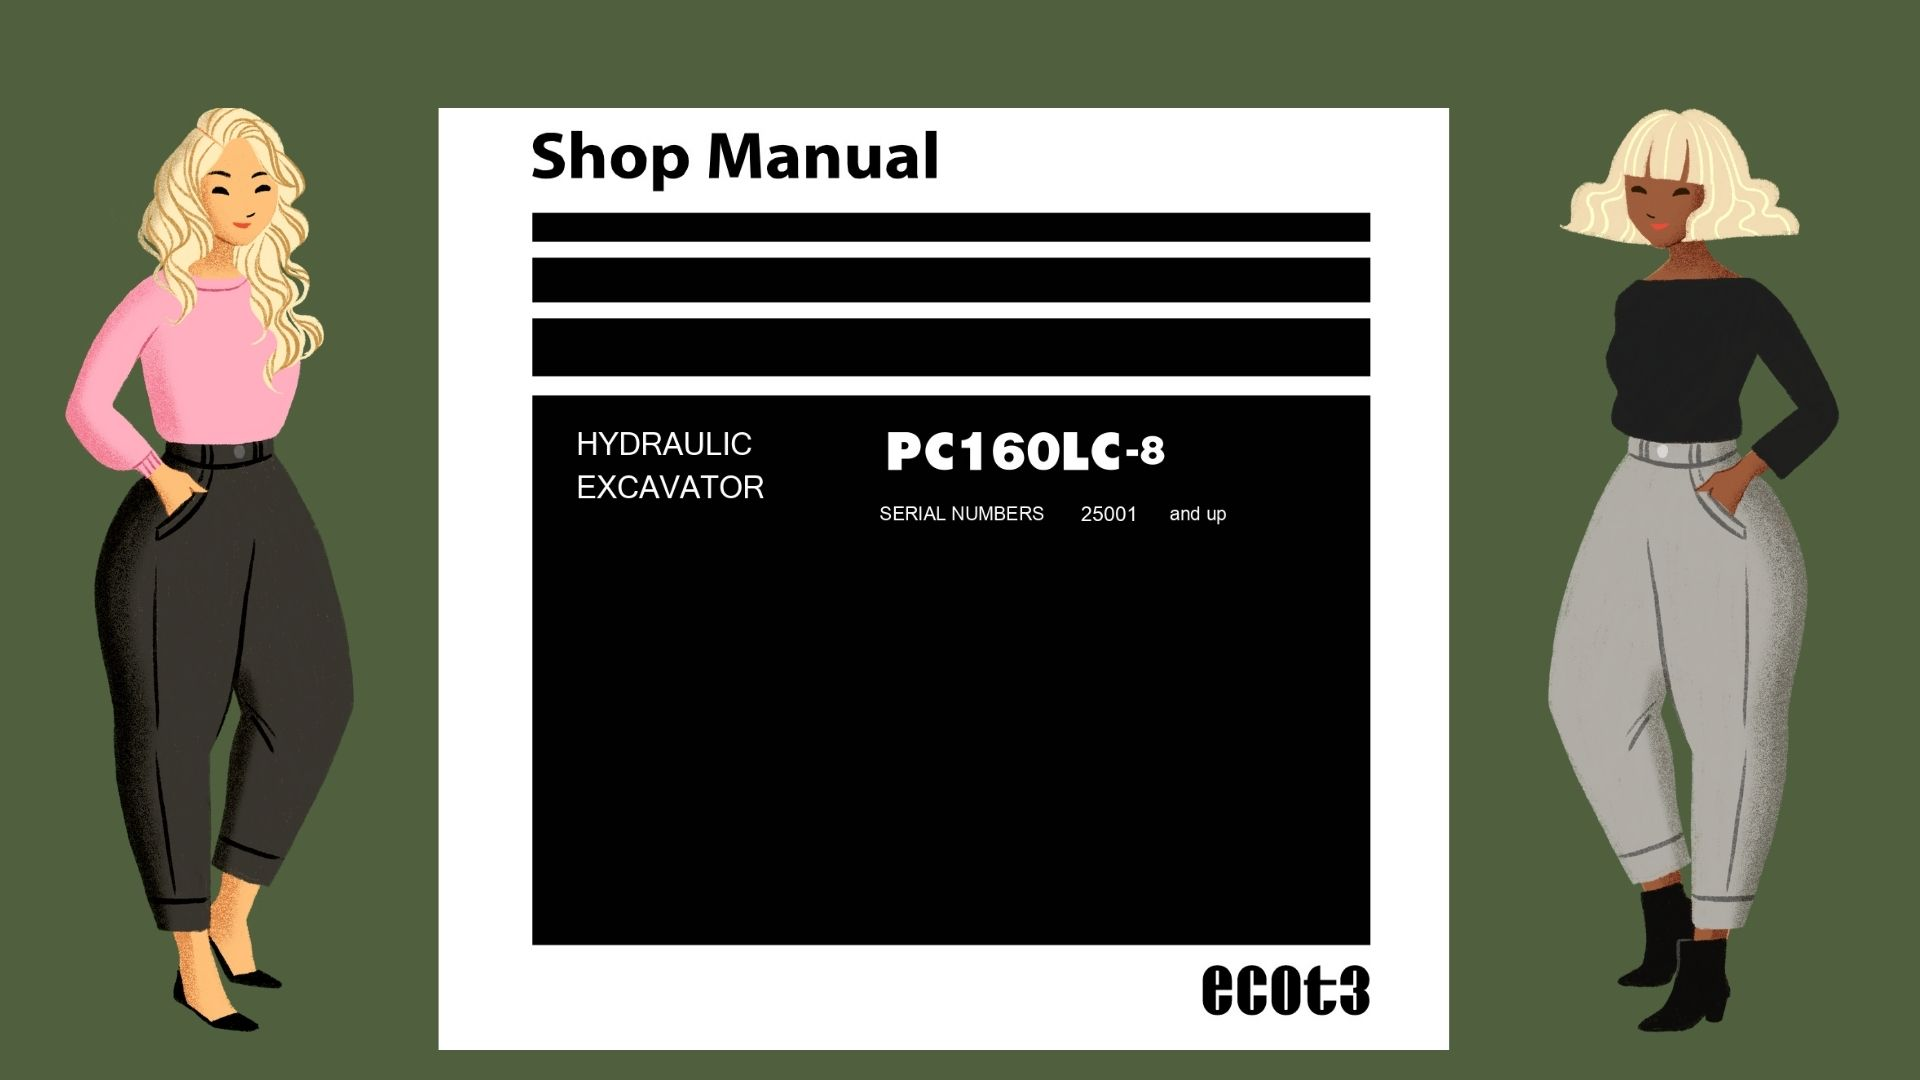 PC160LC-8 Shop Manual Excavator Komatsu